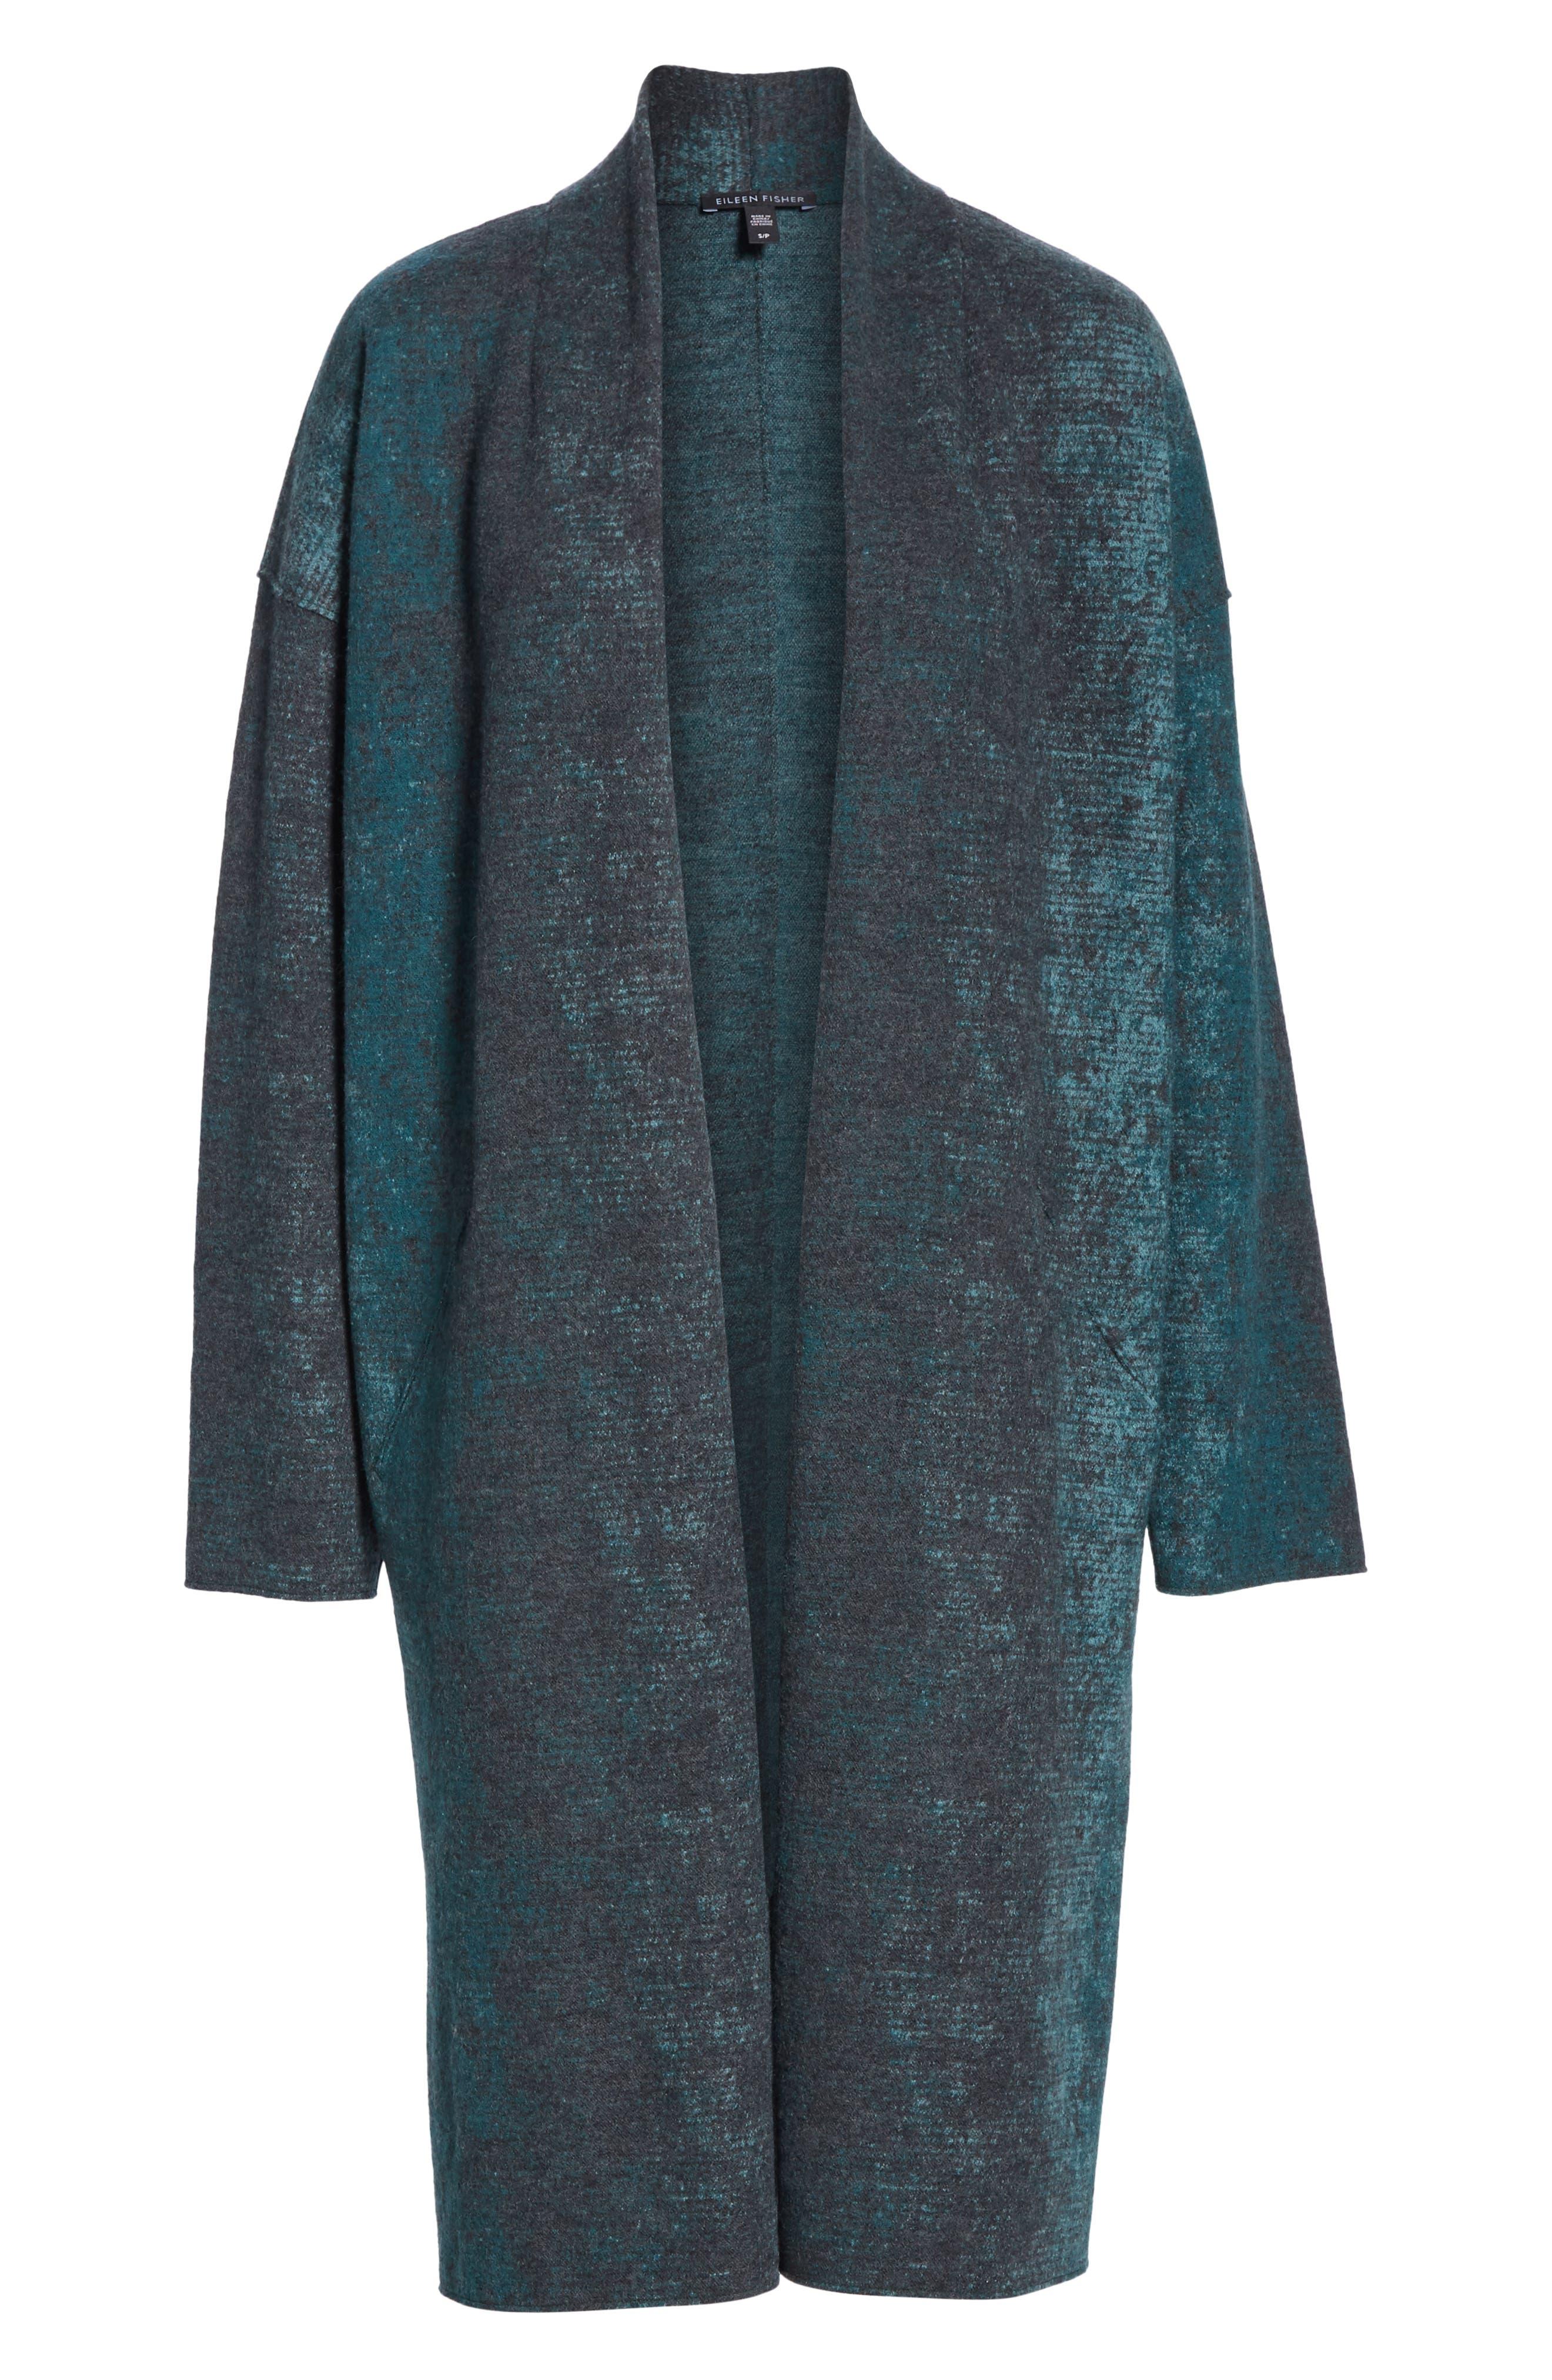 EILEEN FISHER, Wool Blend Kimono Coat, Alternate thumbnail 6, color, PINE